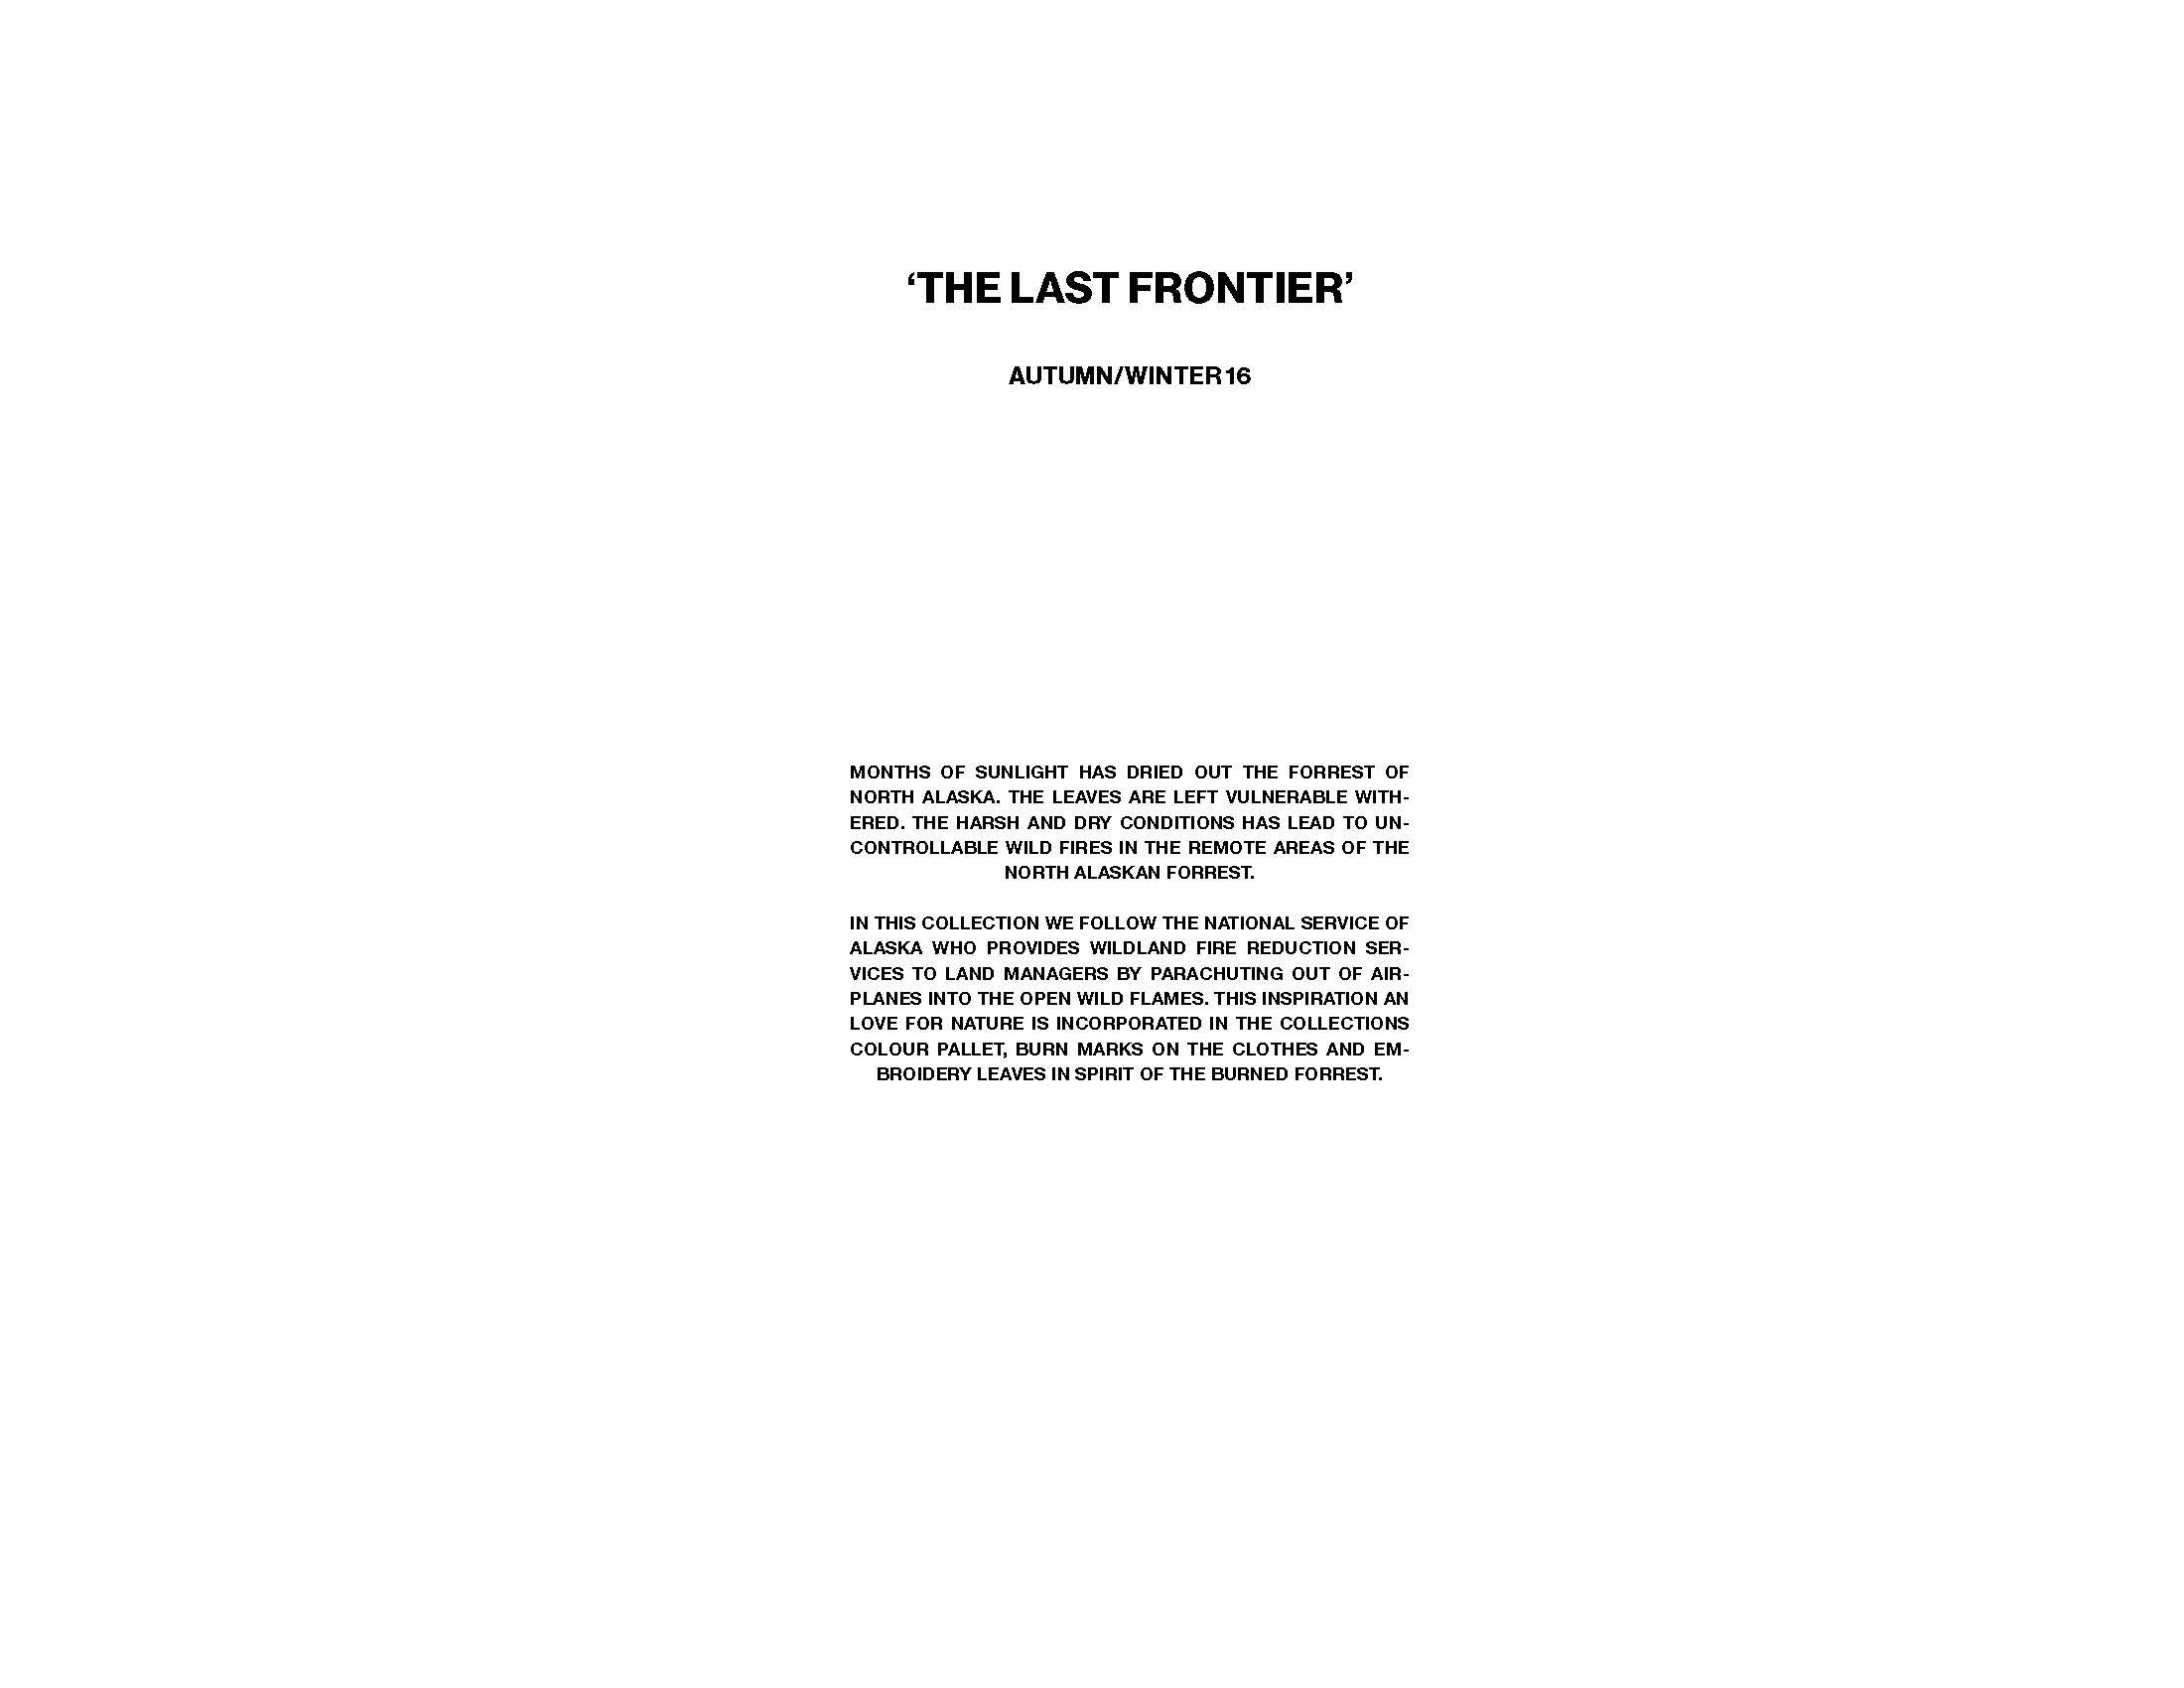 sonsofwilliam_aw16_linesheet_the_last_frontier-%e3%81%ae%e3%82%b3%e3%83%94%e3%83%bc_%e3%83%9a%e3%83%bc%e3%82%b8_002